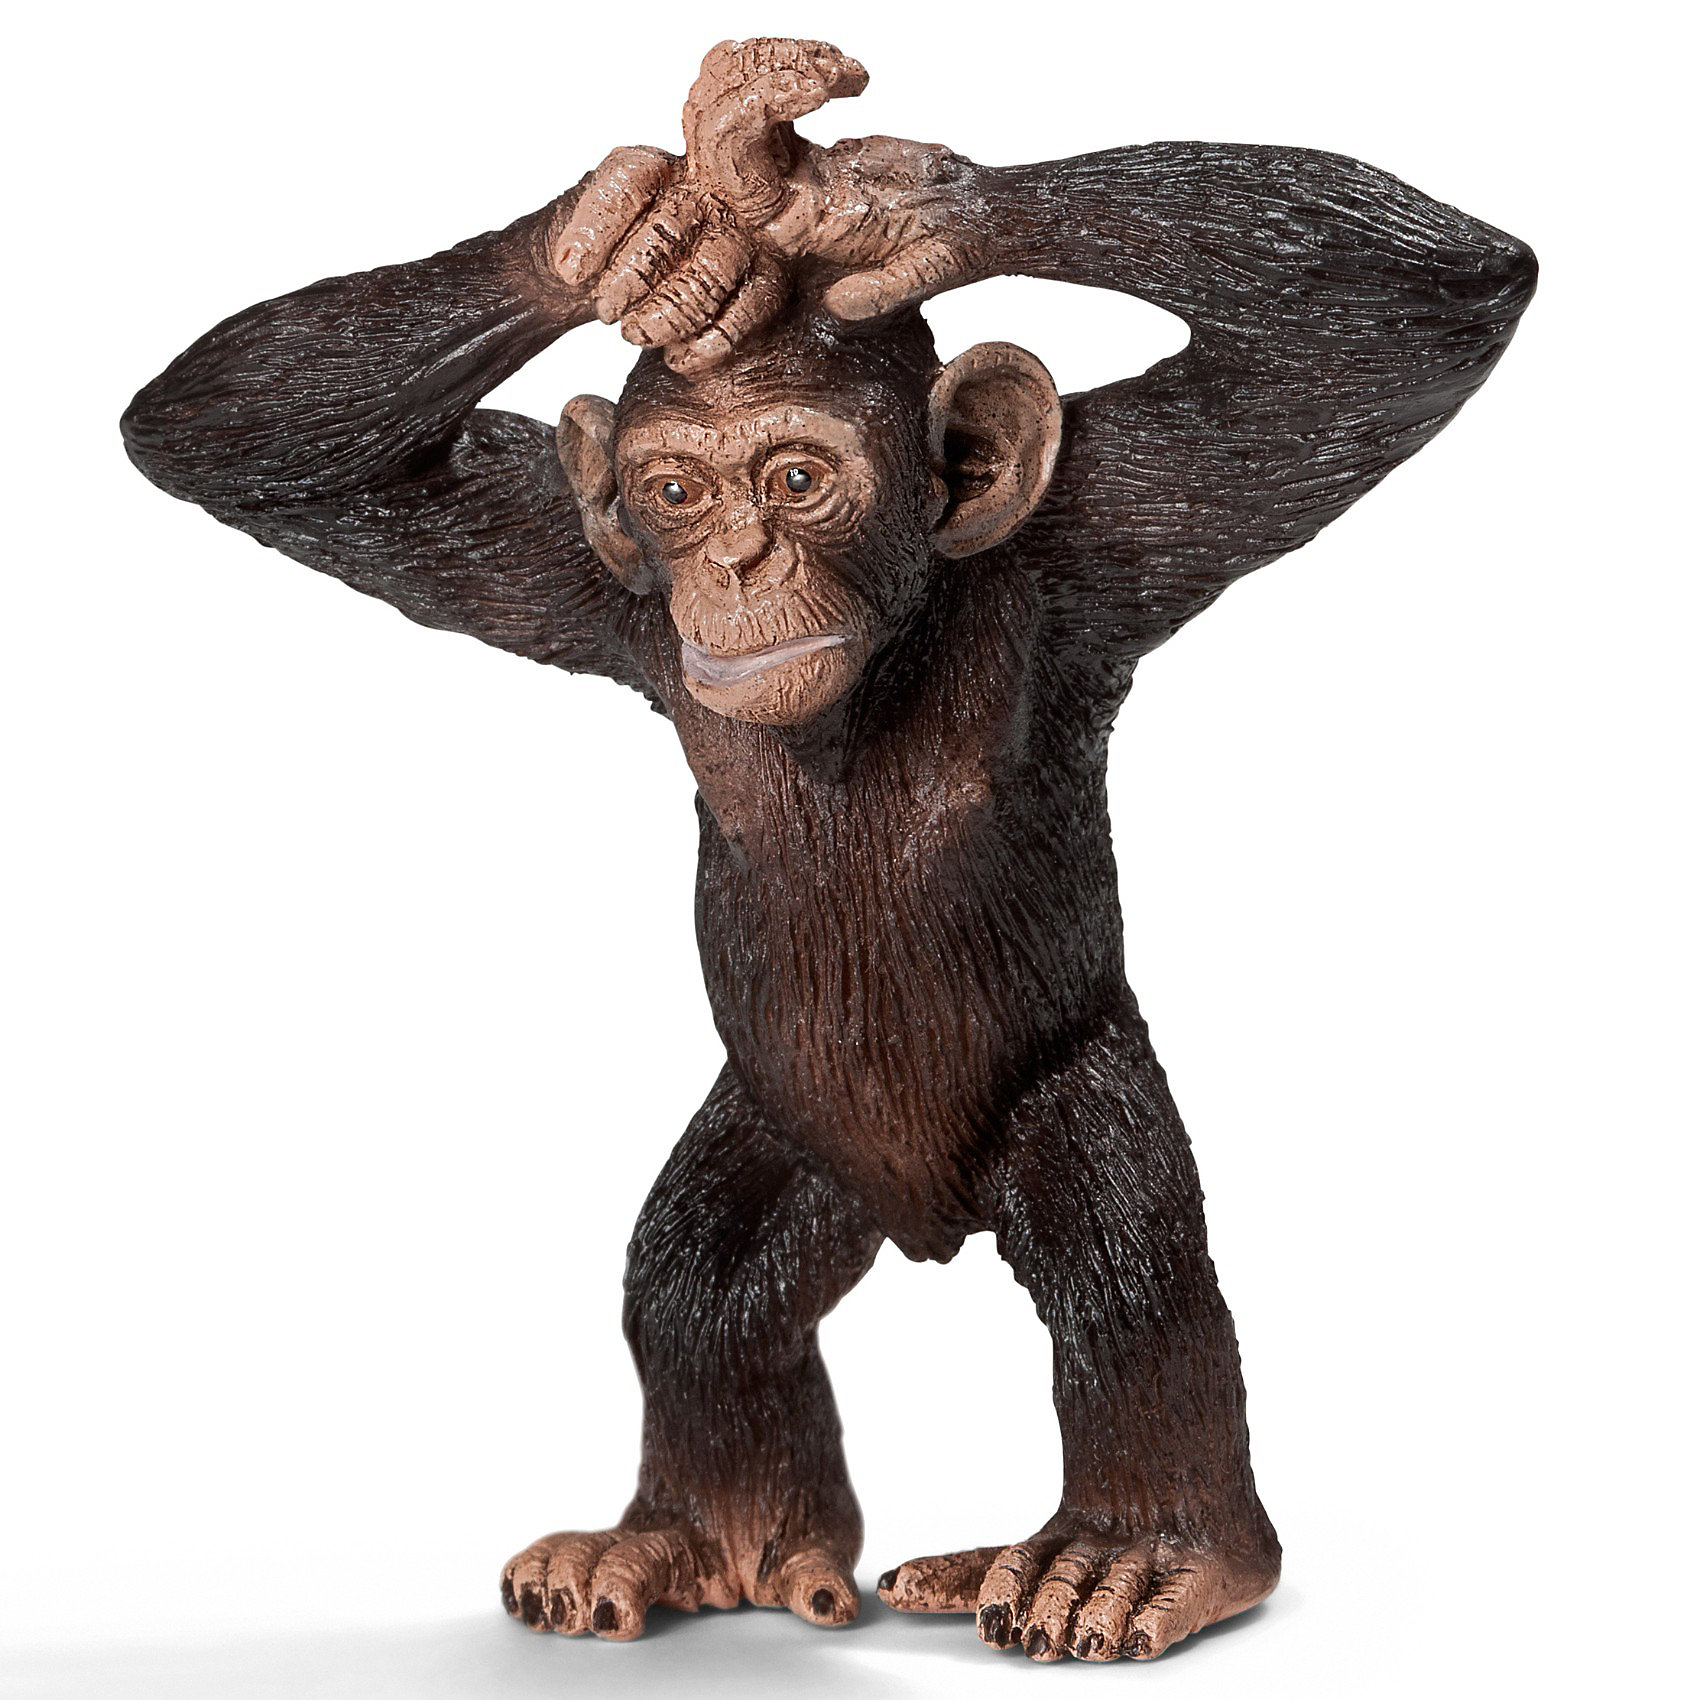 Schleich Schleich Шимпанзе, детеныш. Серия Дикие животные животные серия антистресс альбом